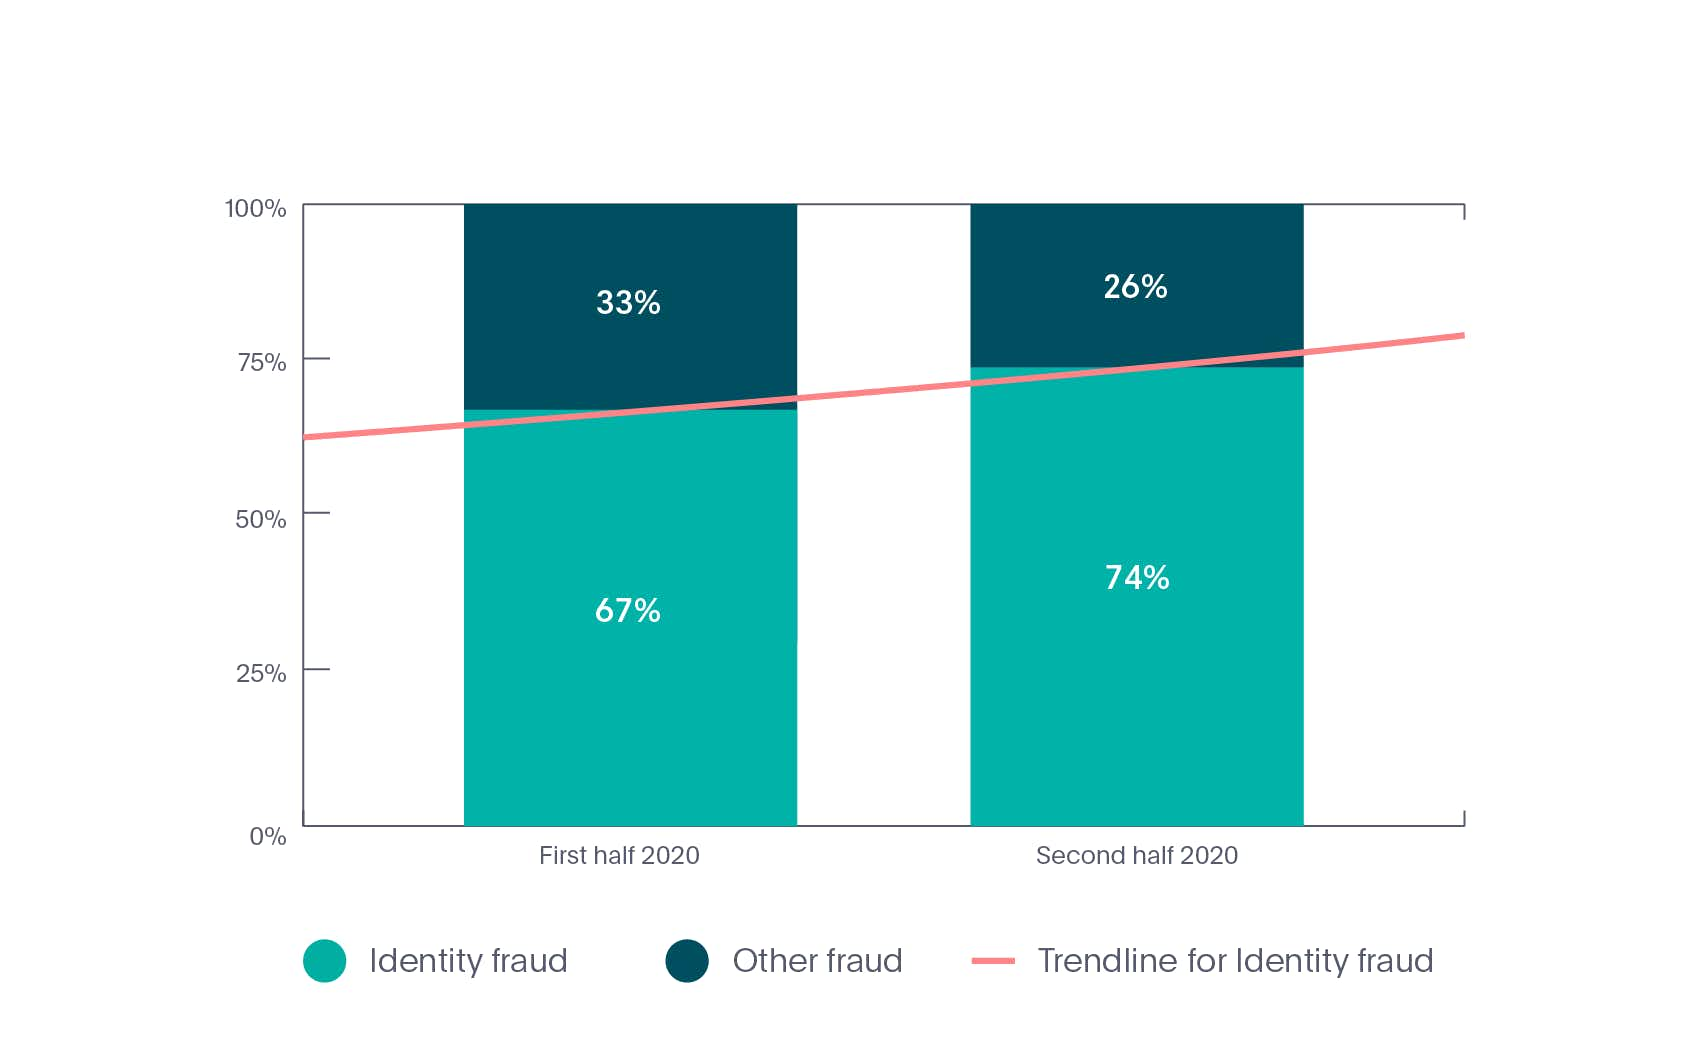 Online identity fraud rate in Fintech industry in 2020